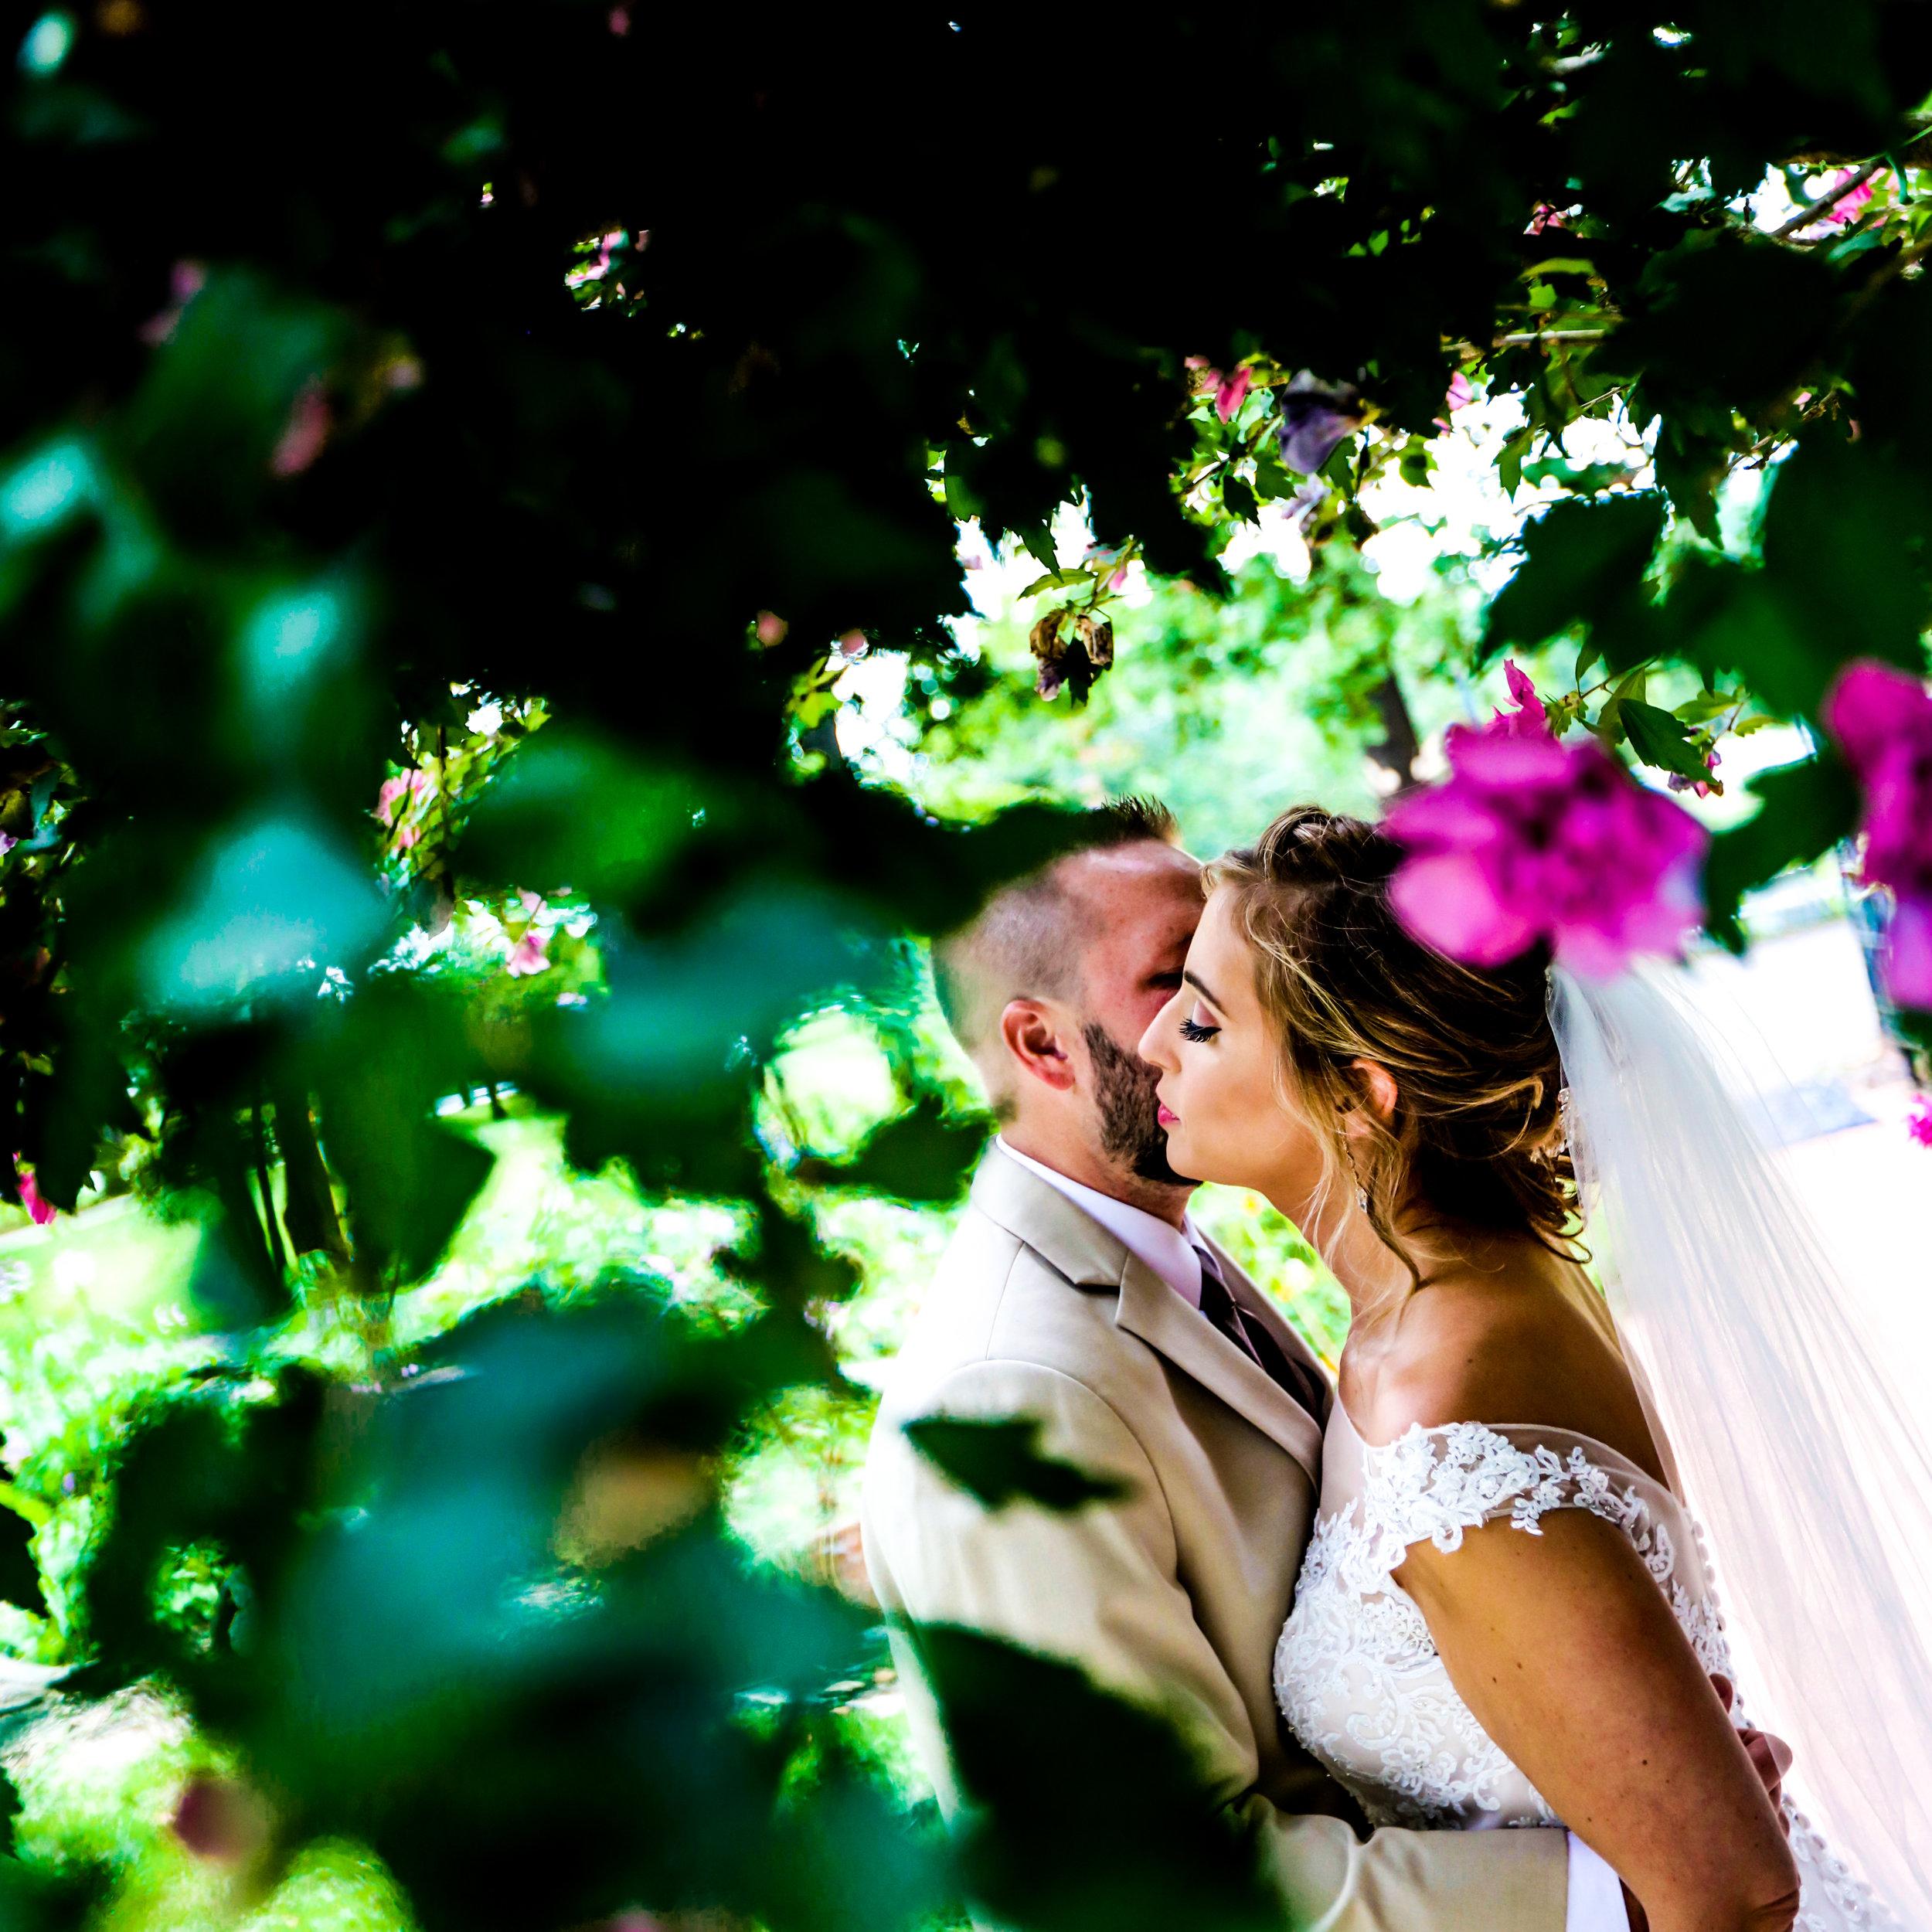 WeddingWebsite-47.jpg